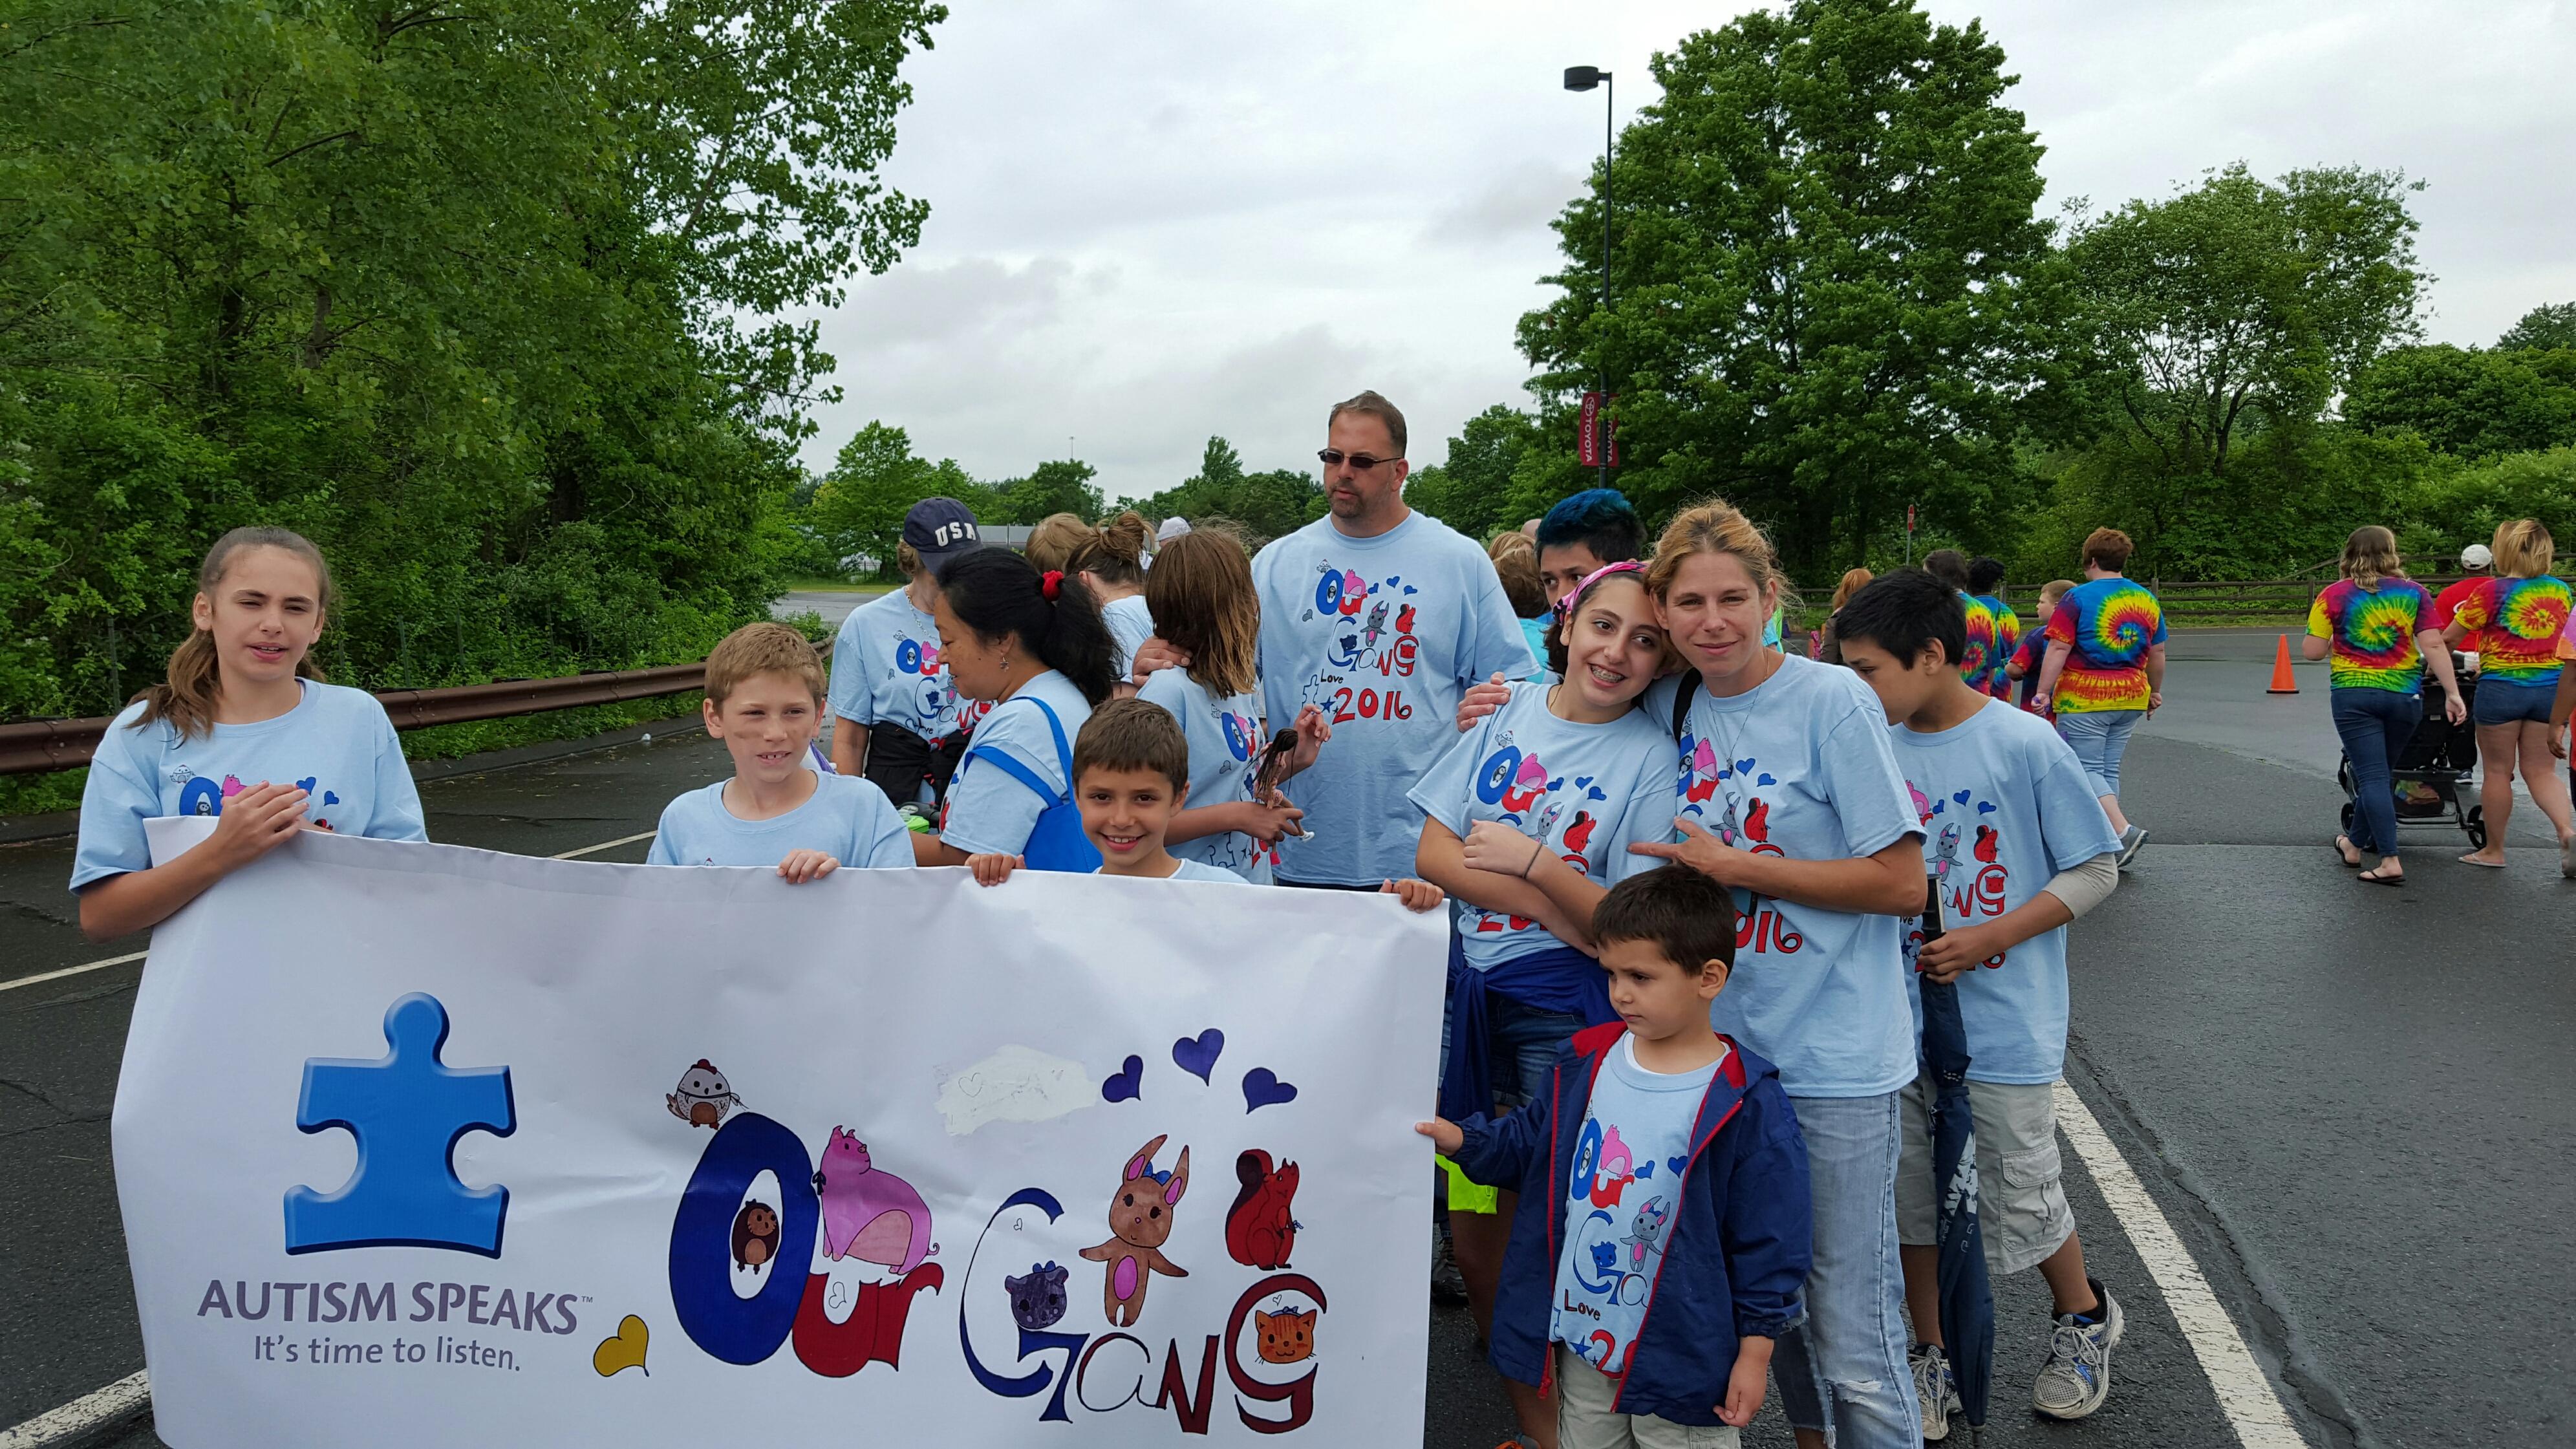 Shirt design tampa - Our Gang Autism Walk T Shirt Photo